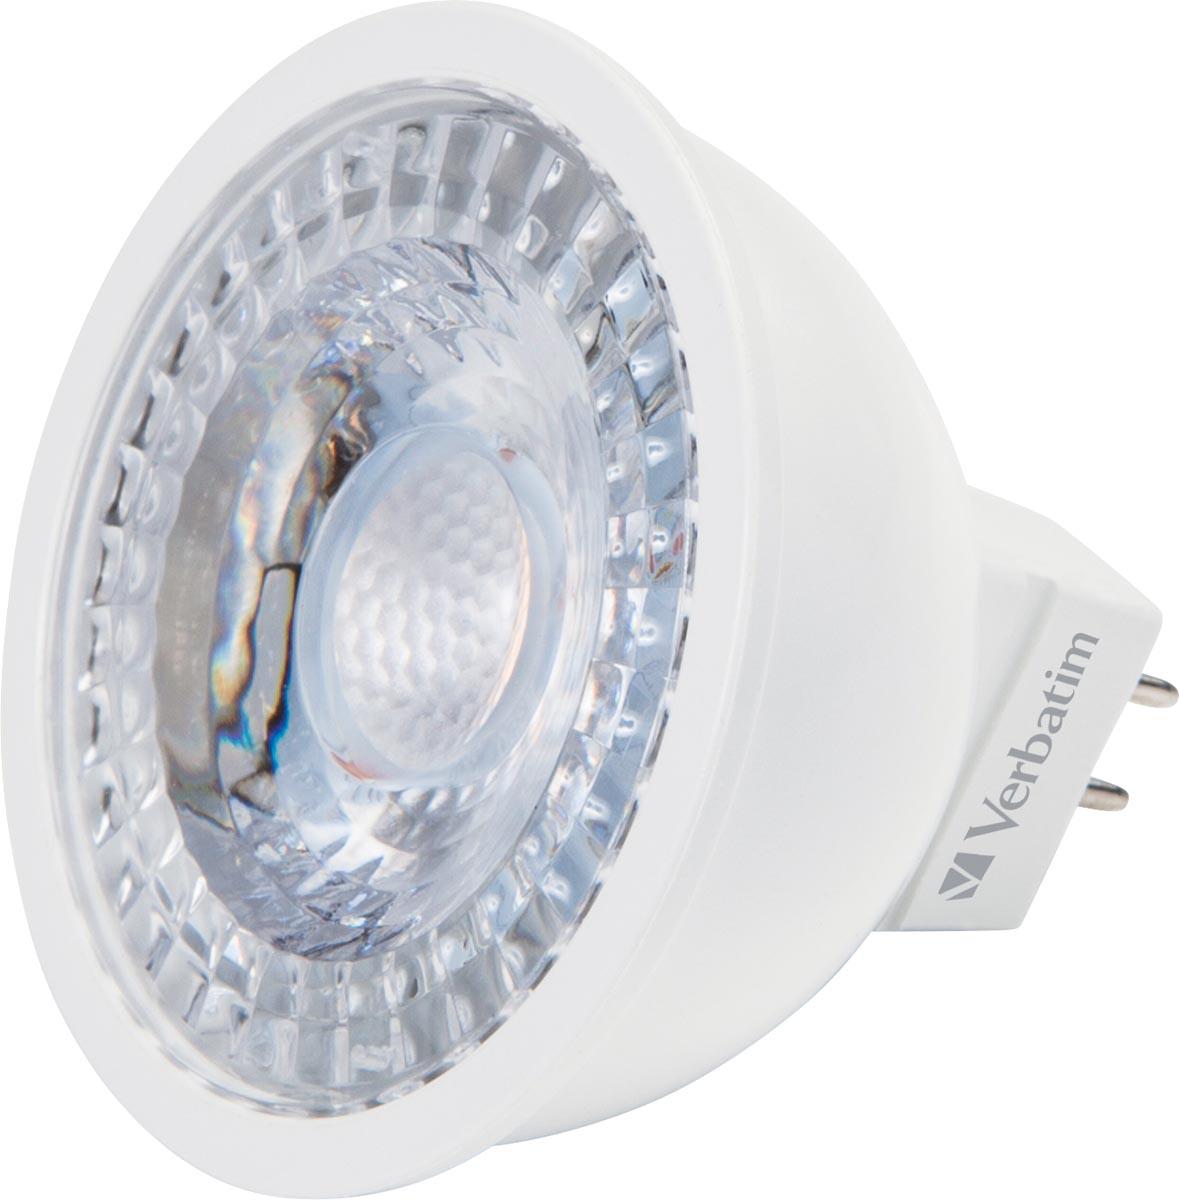 Verbatim LED spot, fitting GU5.3, 4,8 W, 2700 K